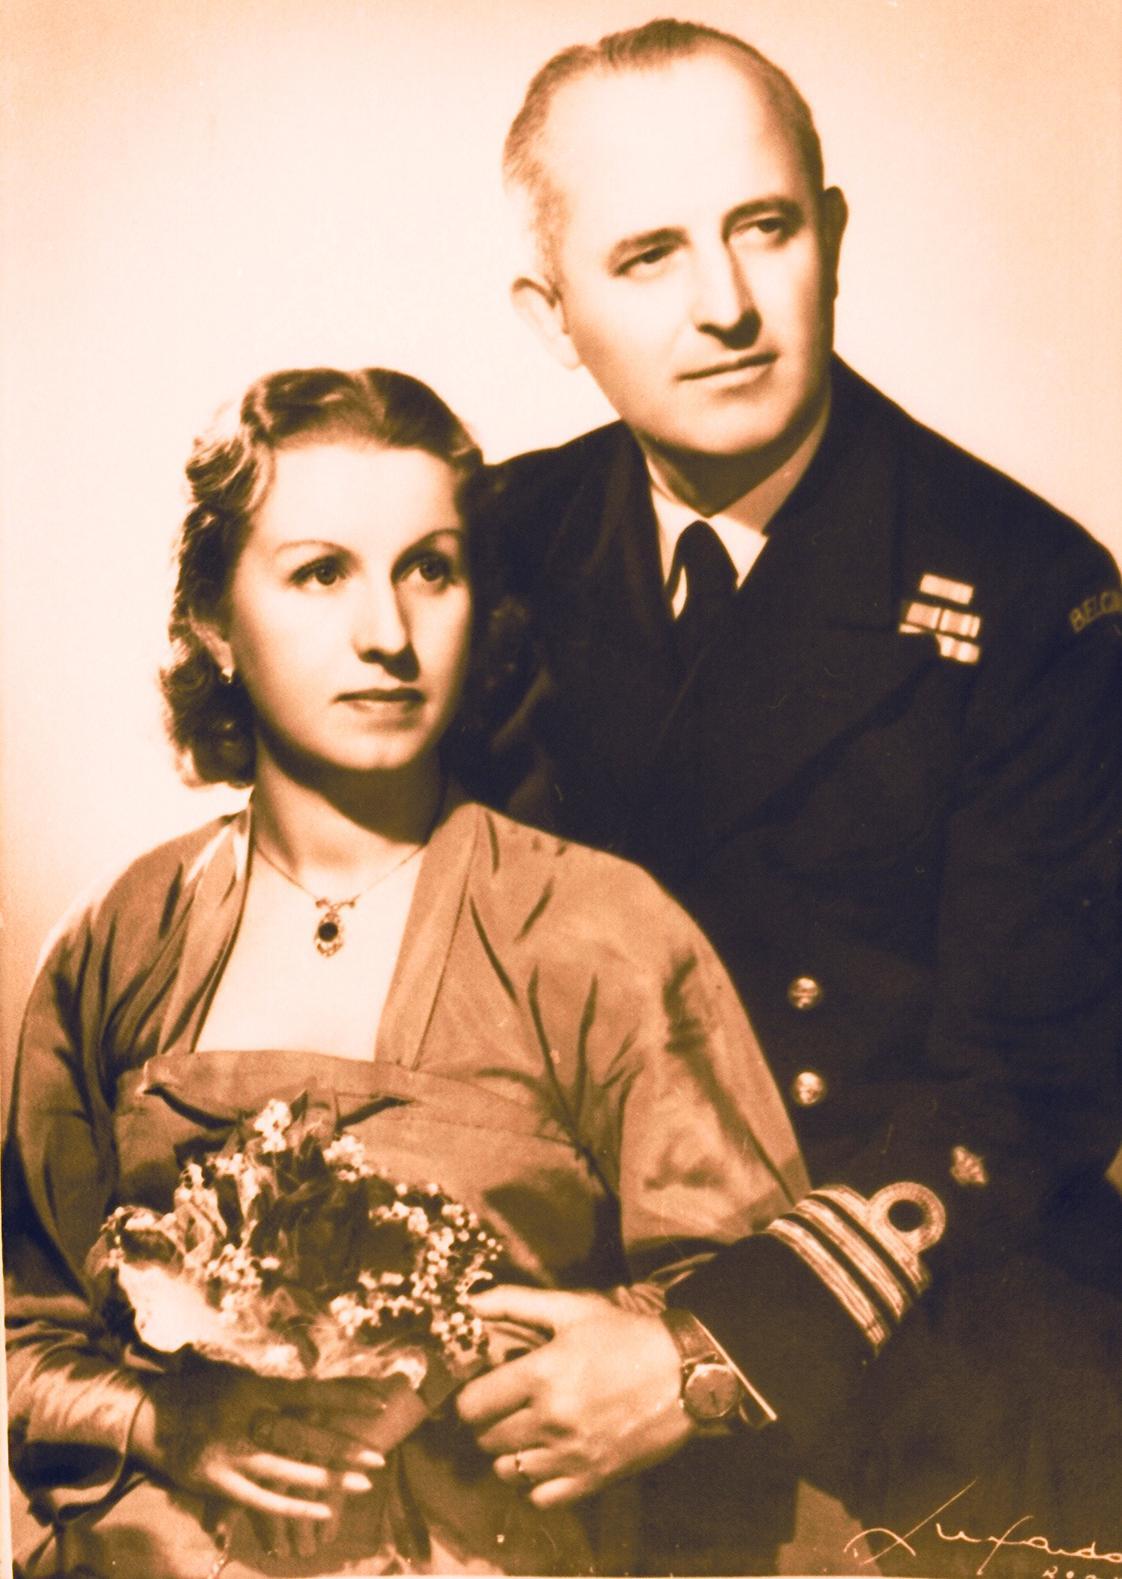 M. Stará a G. Stainier - svatební fotografie